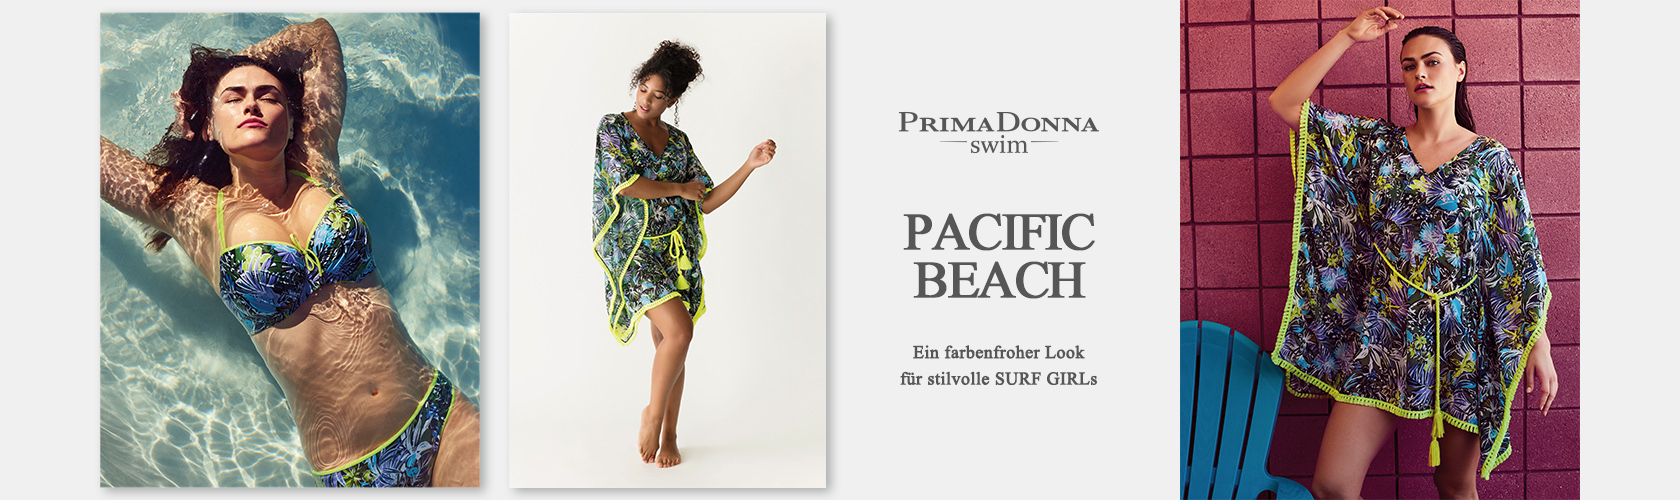 Slideshow PACIFIC BEACH SFG 24.04.